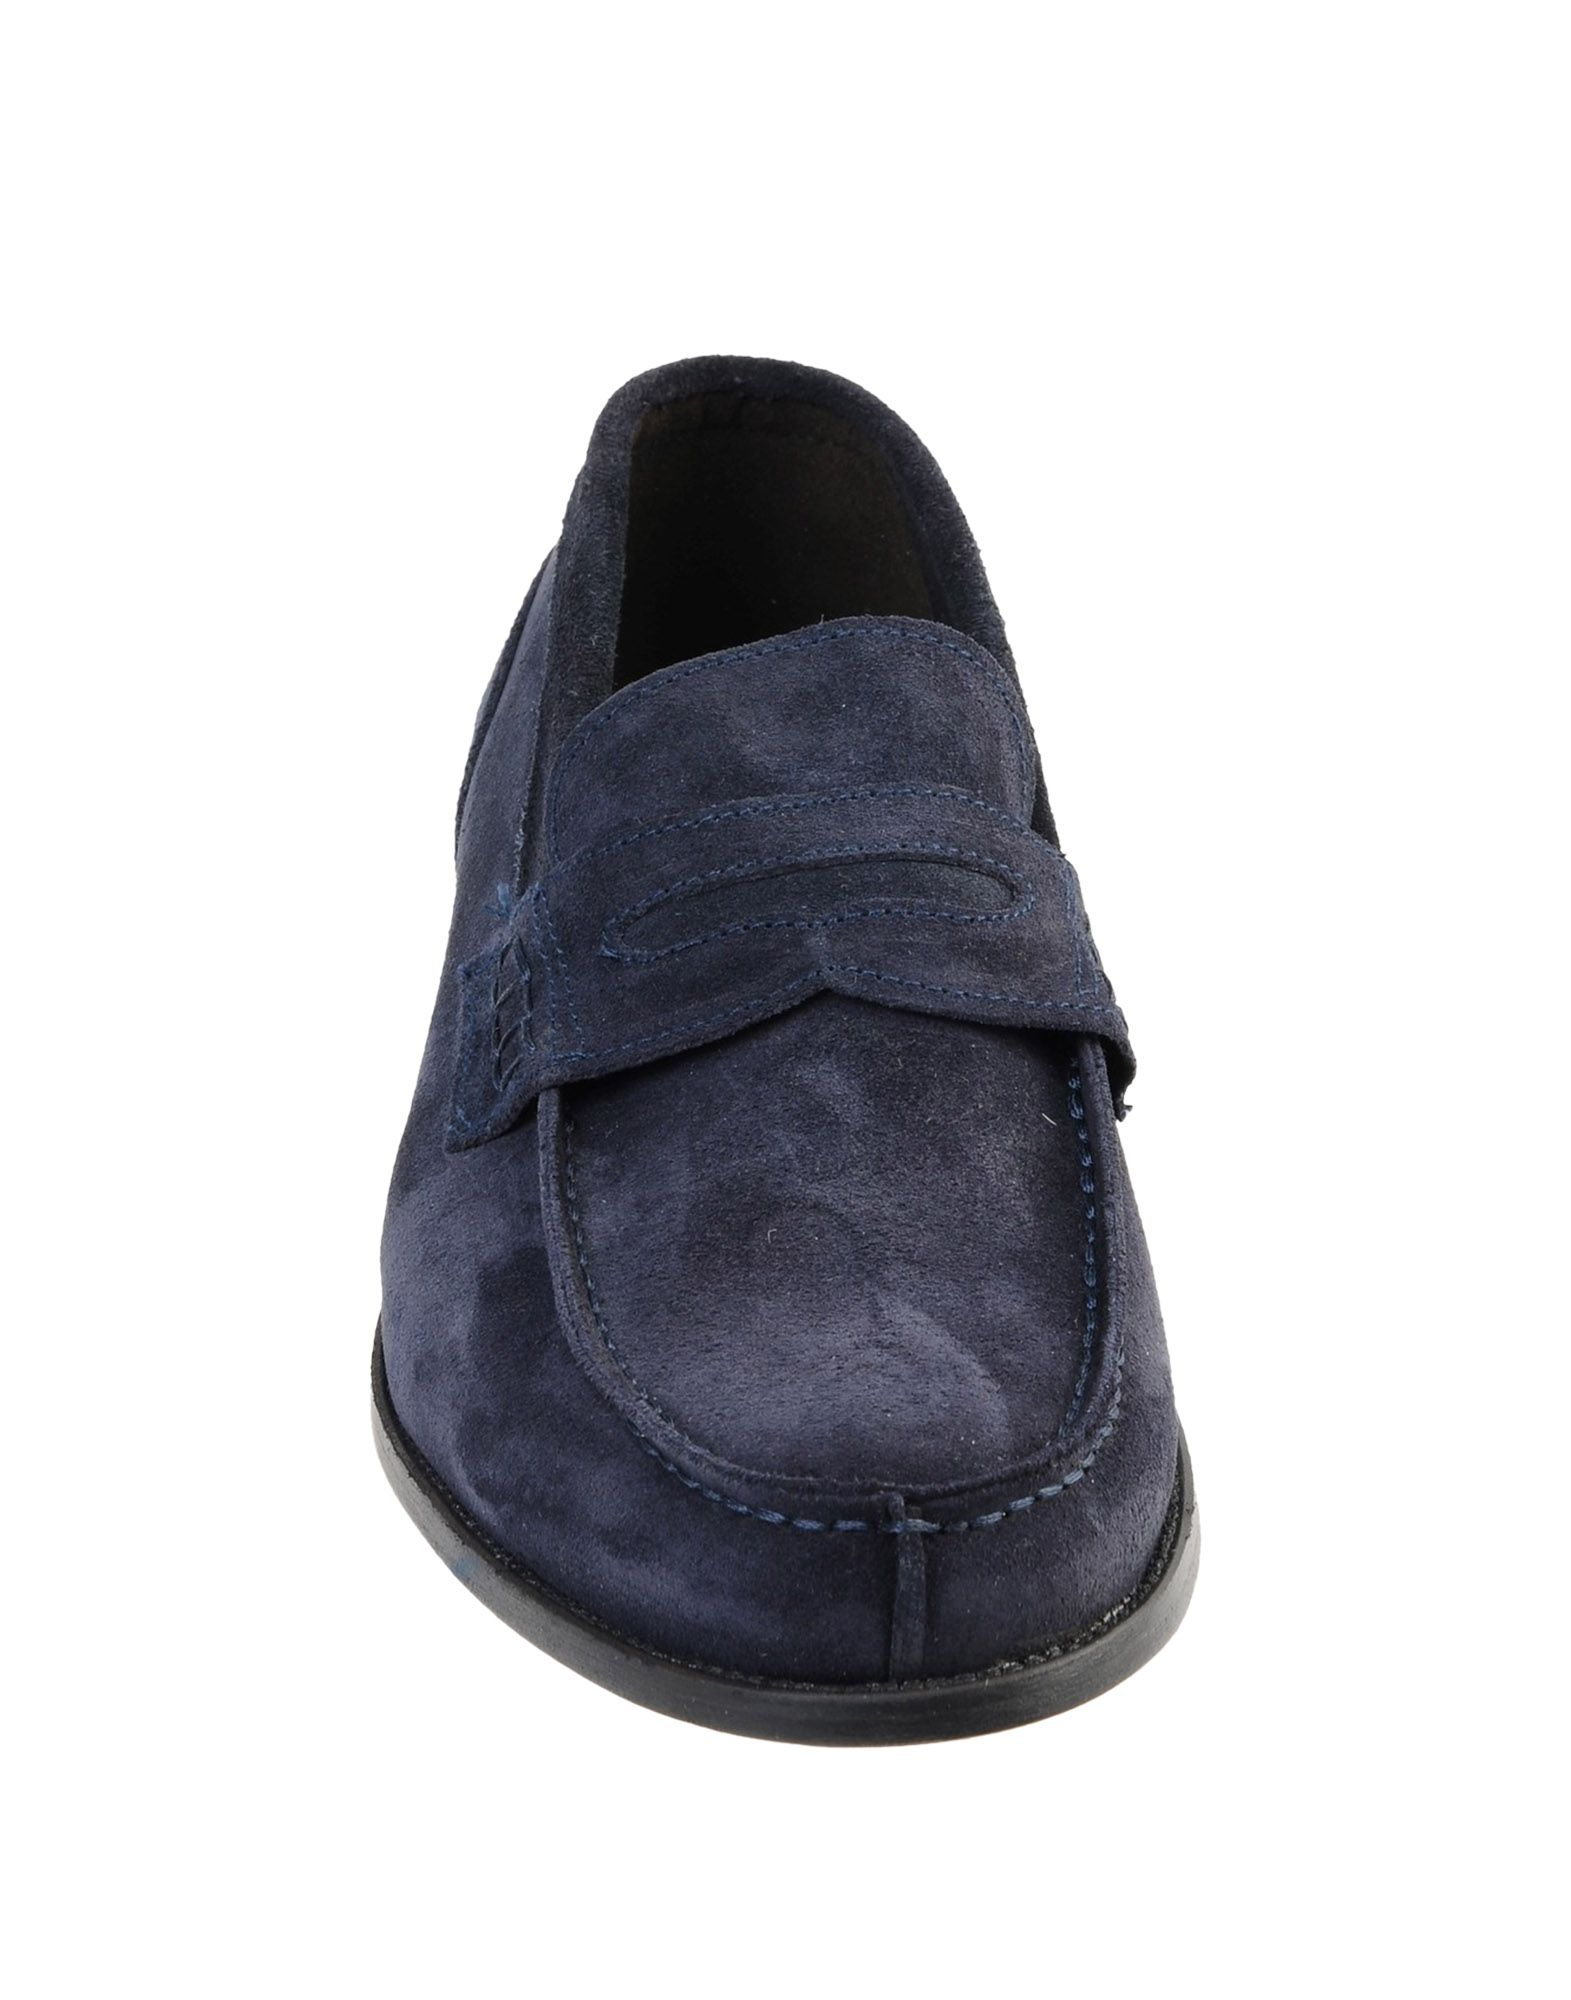 Antony Sander Loafers Loafers Loafers - Men Antony Sander Loafers online on  Australia - 11457011XL 66038c